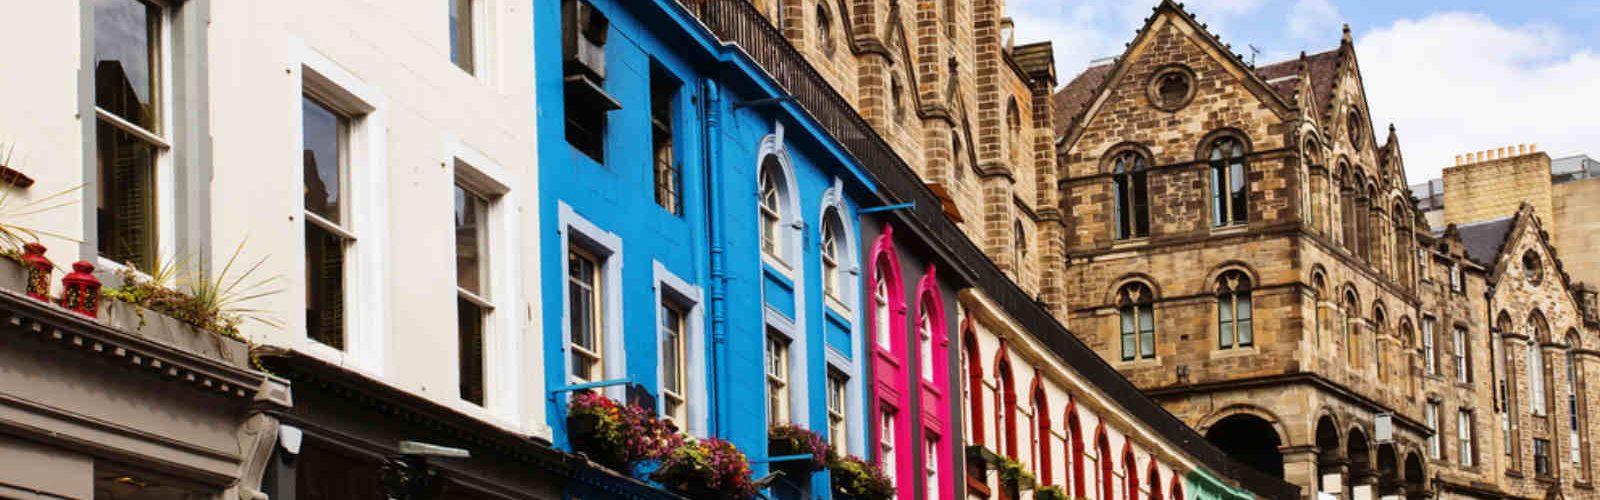 Shops in Edinburgh